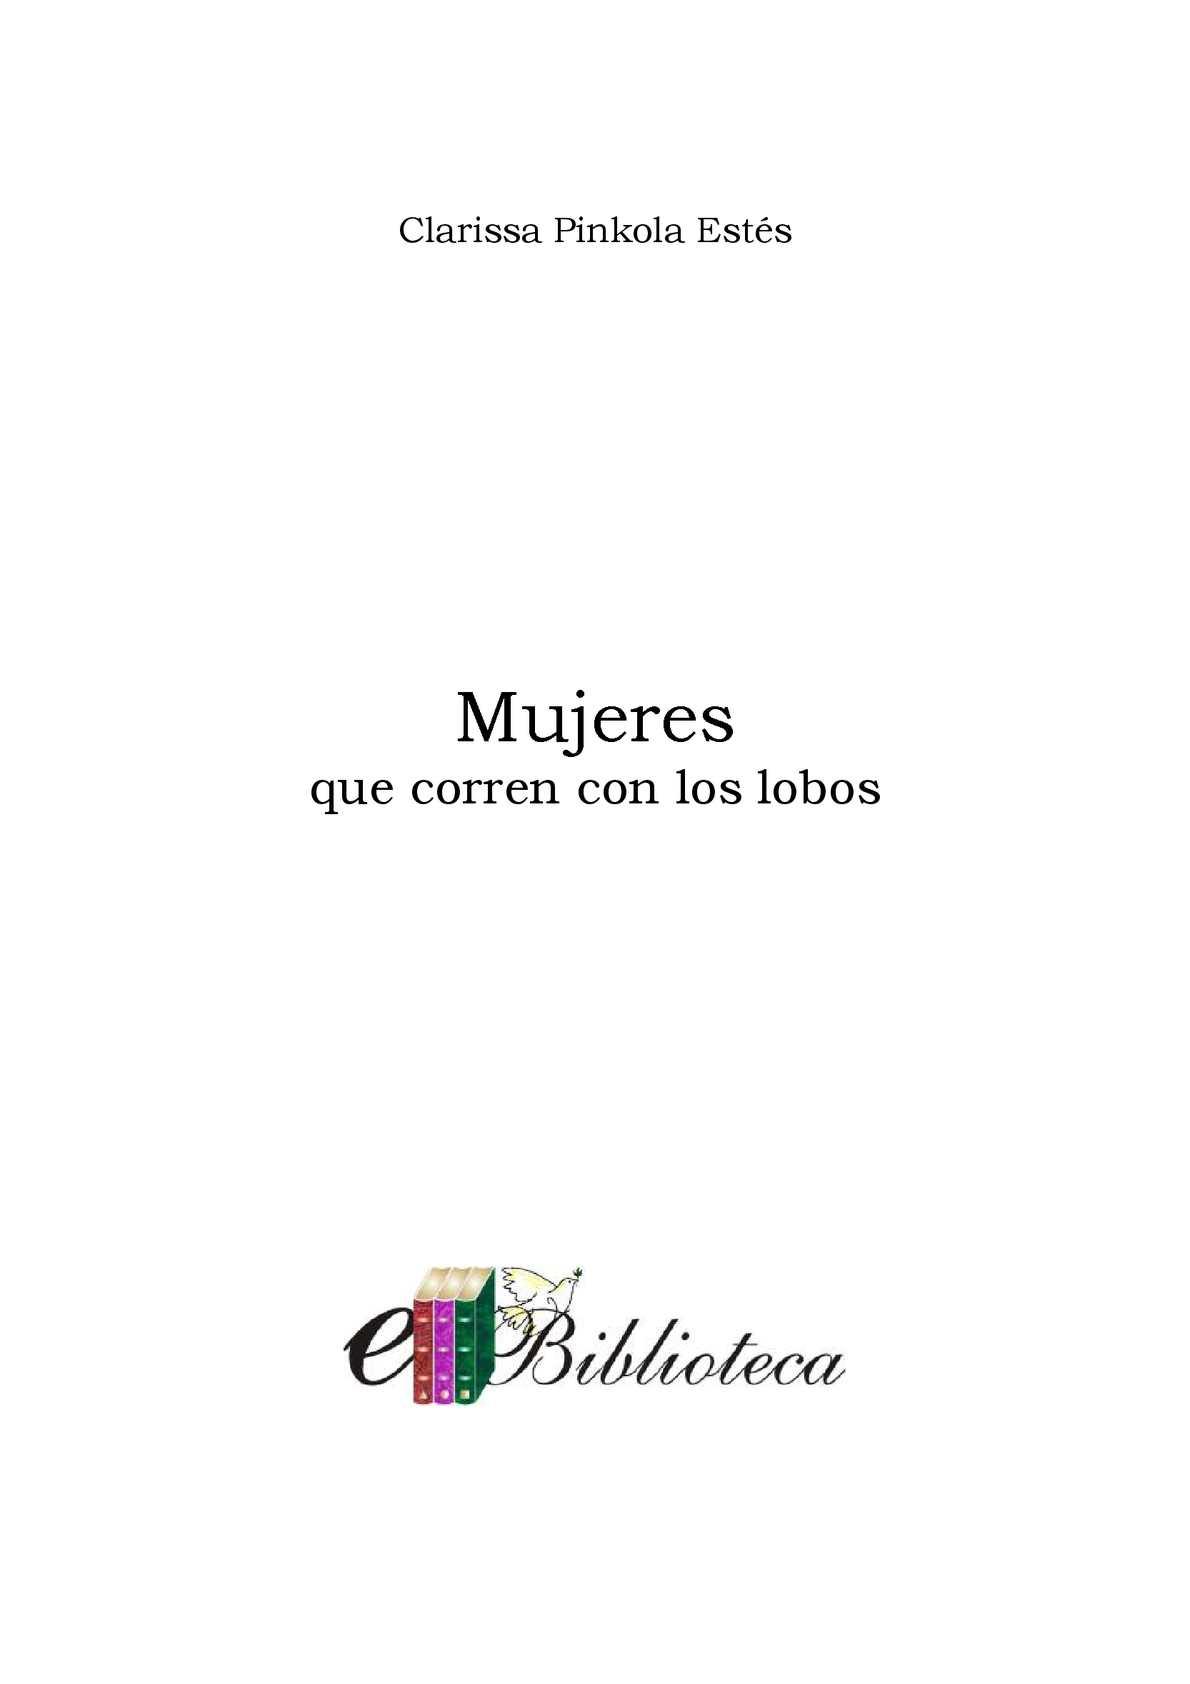 Mujeres Solteras 341013